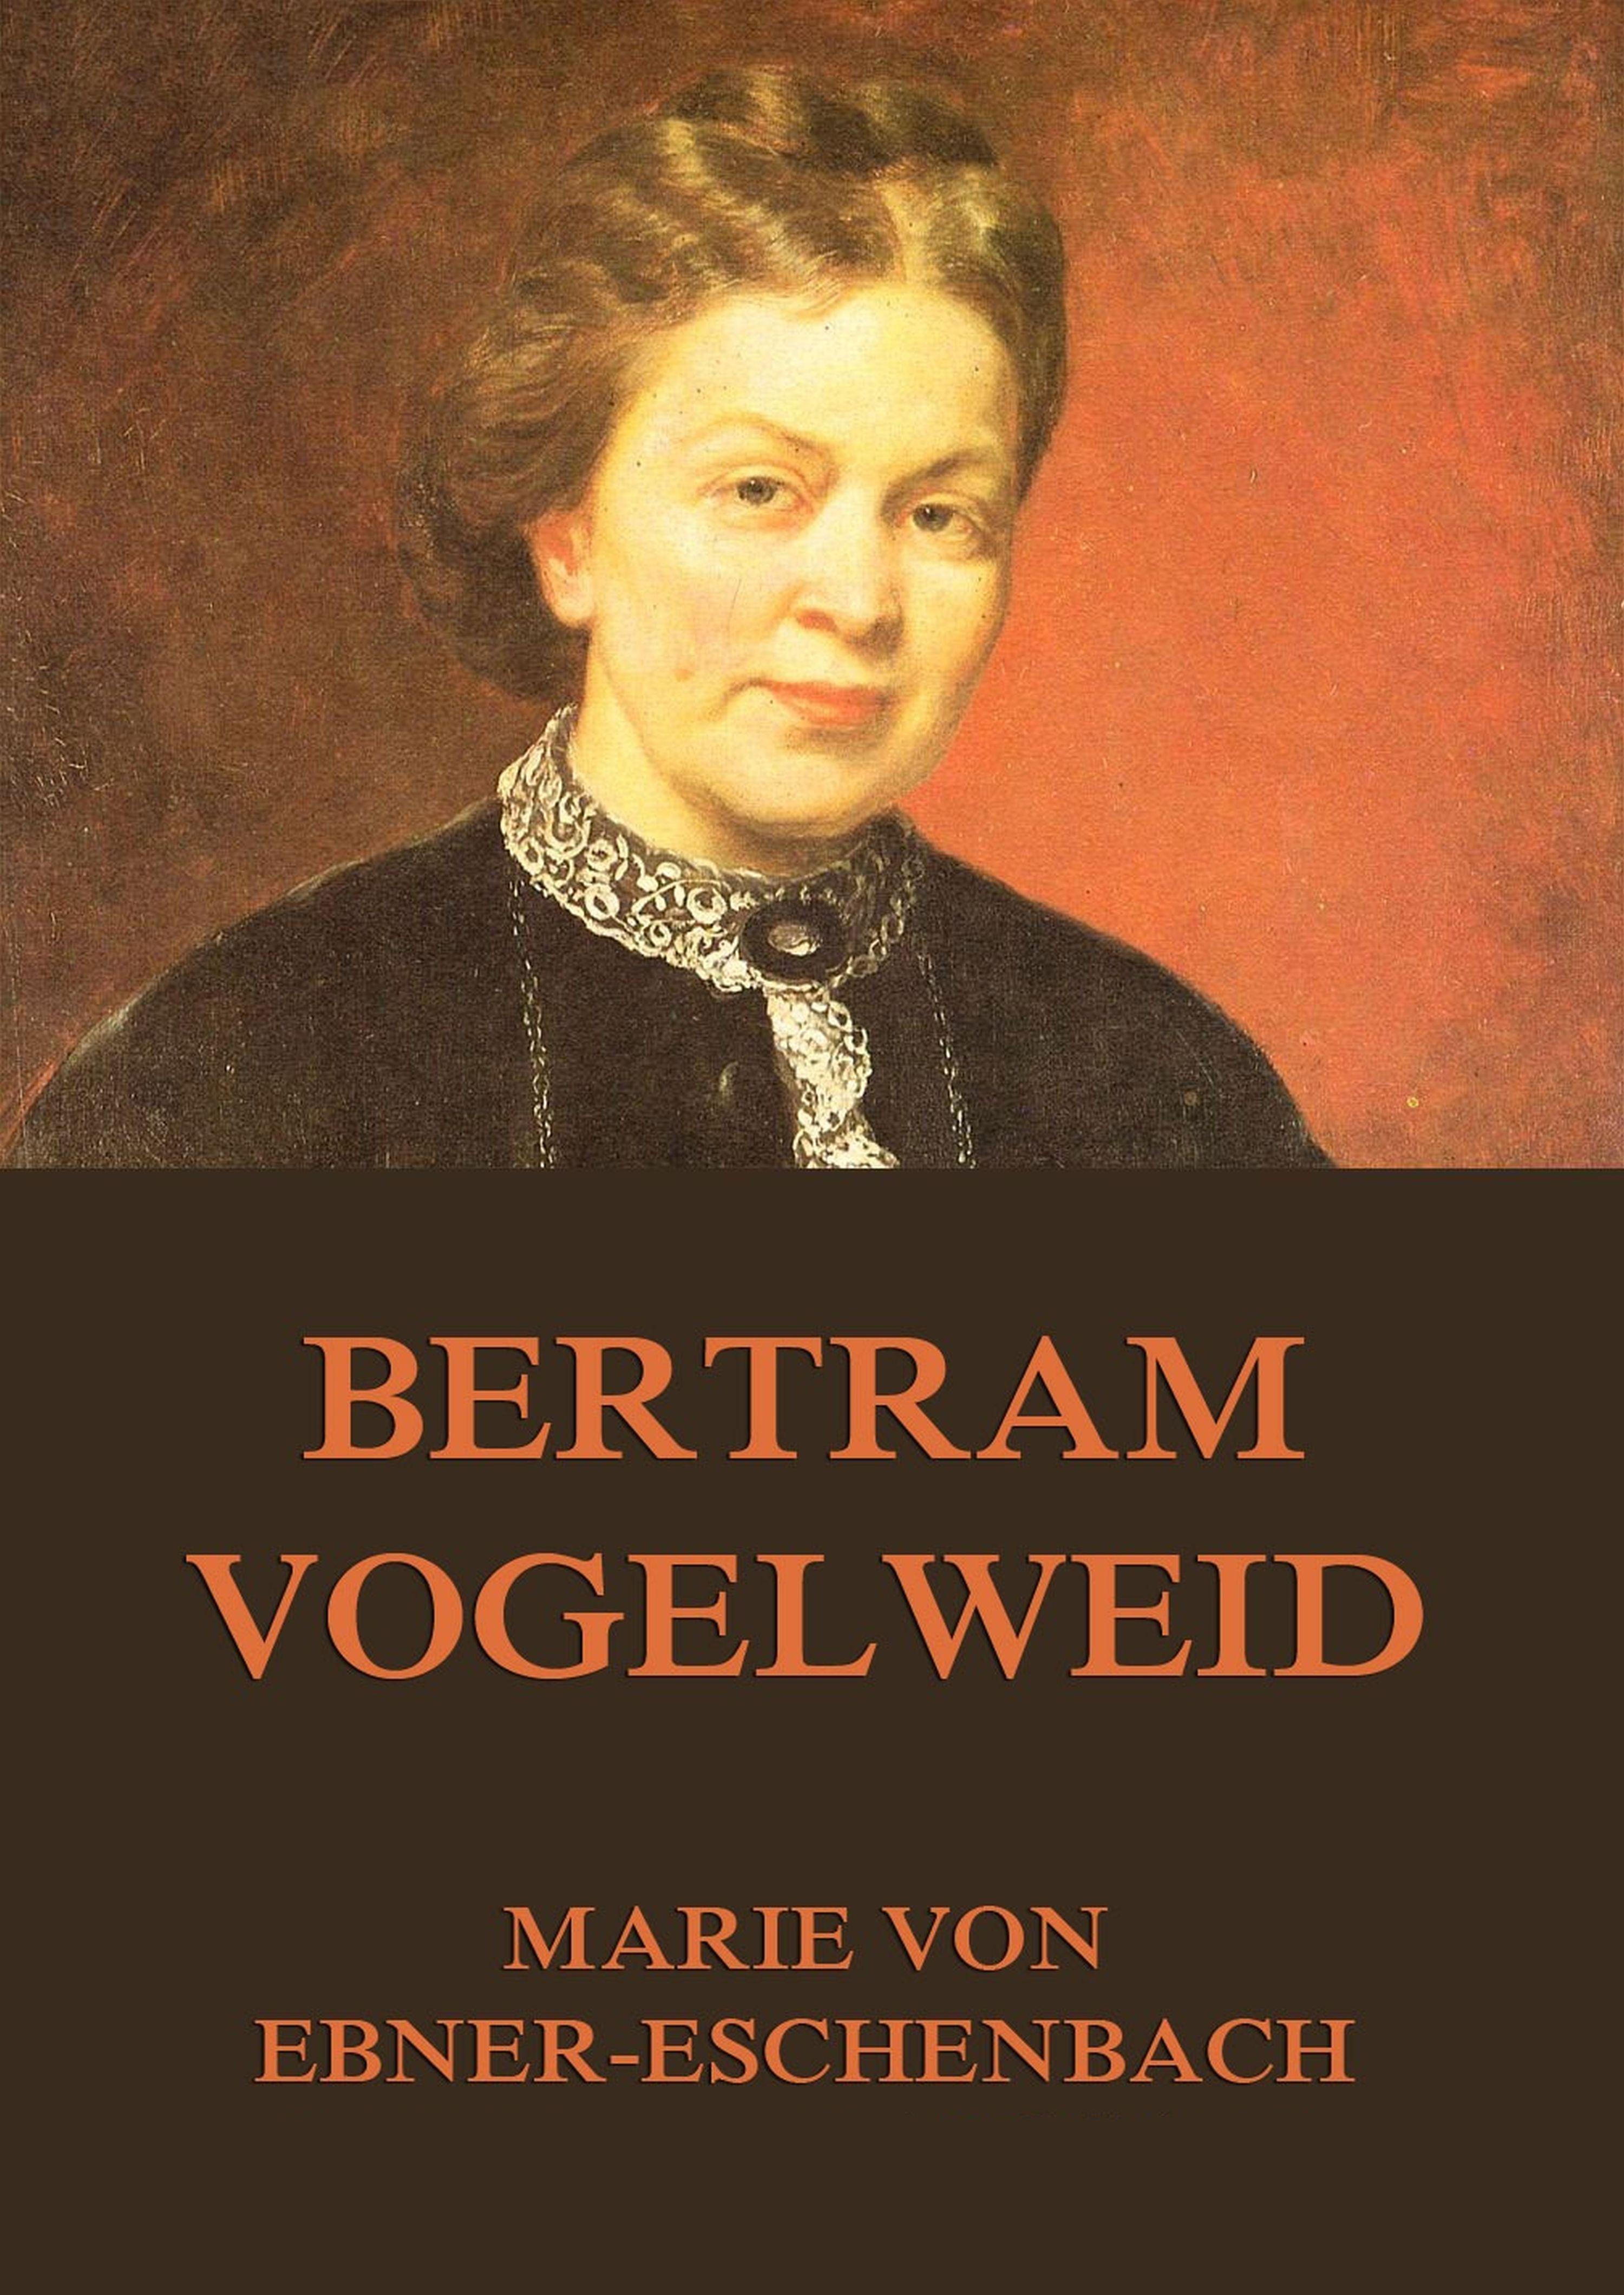 Marie von Ebner-Eschenbach Bertram Vogelweid eschenbach classic 6x